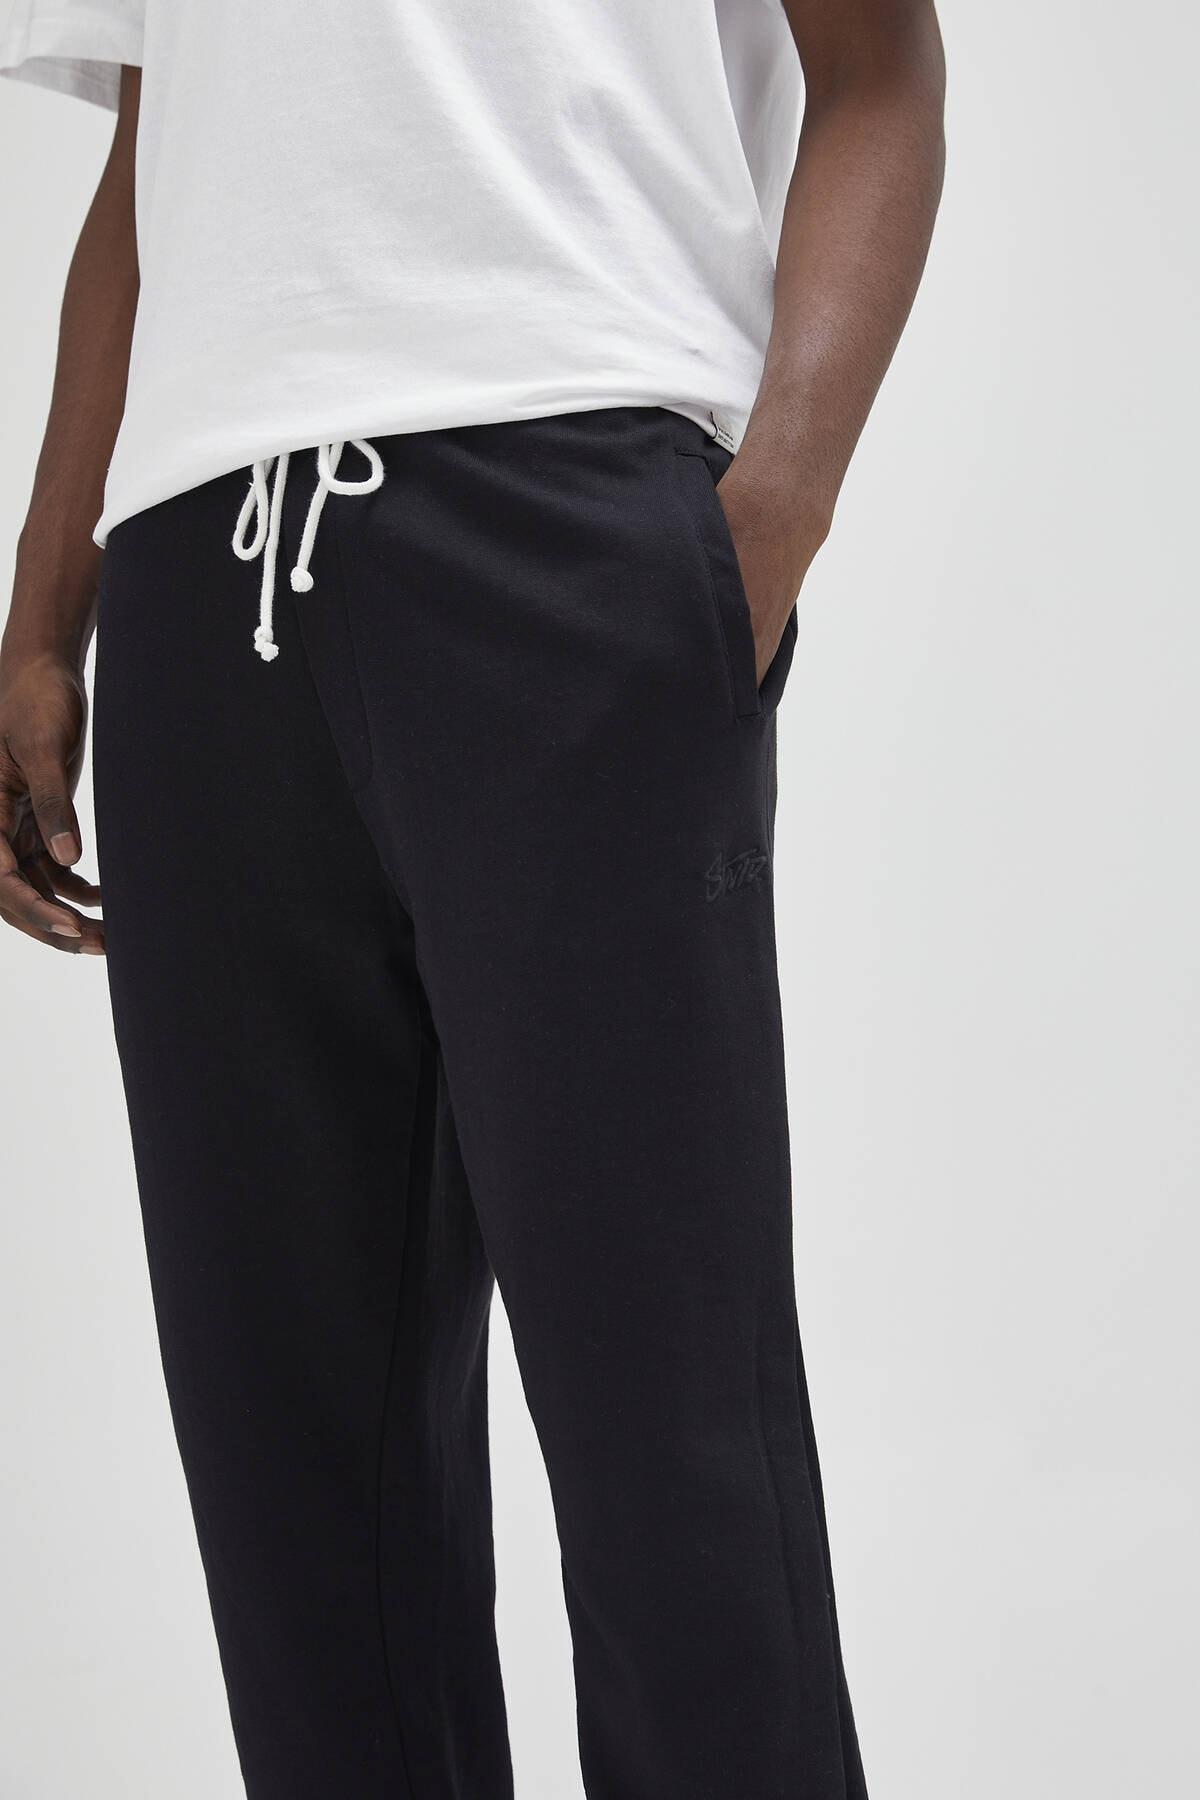 Pull & Bear Erkek Siyah Renkli Jogging Fit Pantolon 04676513 4